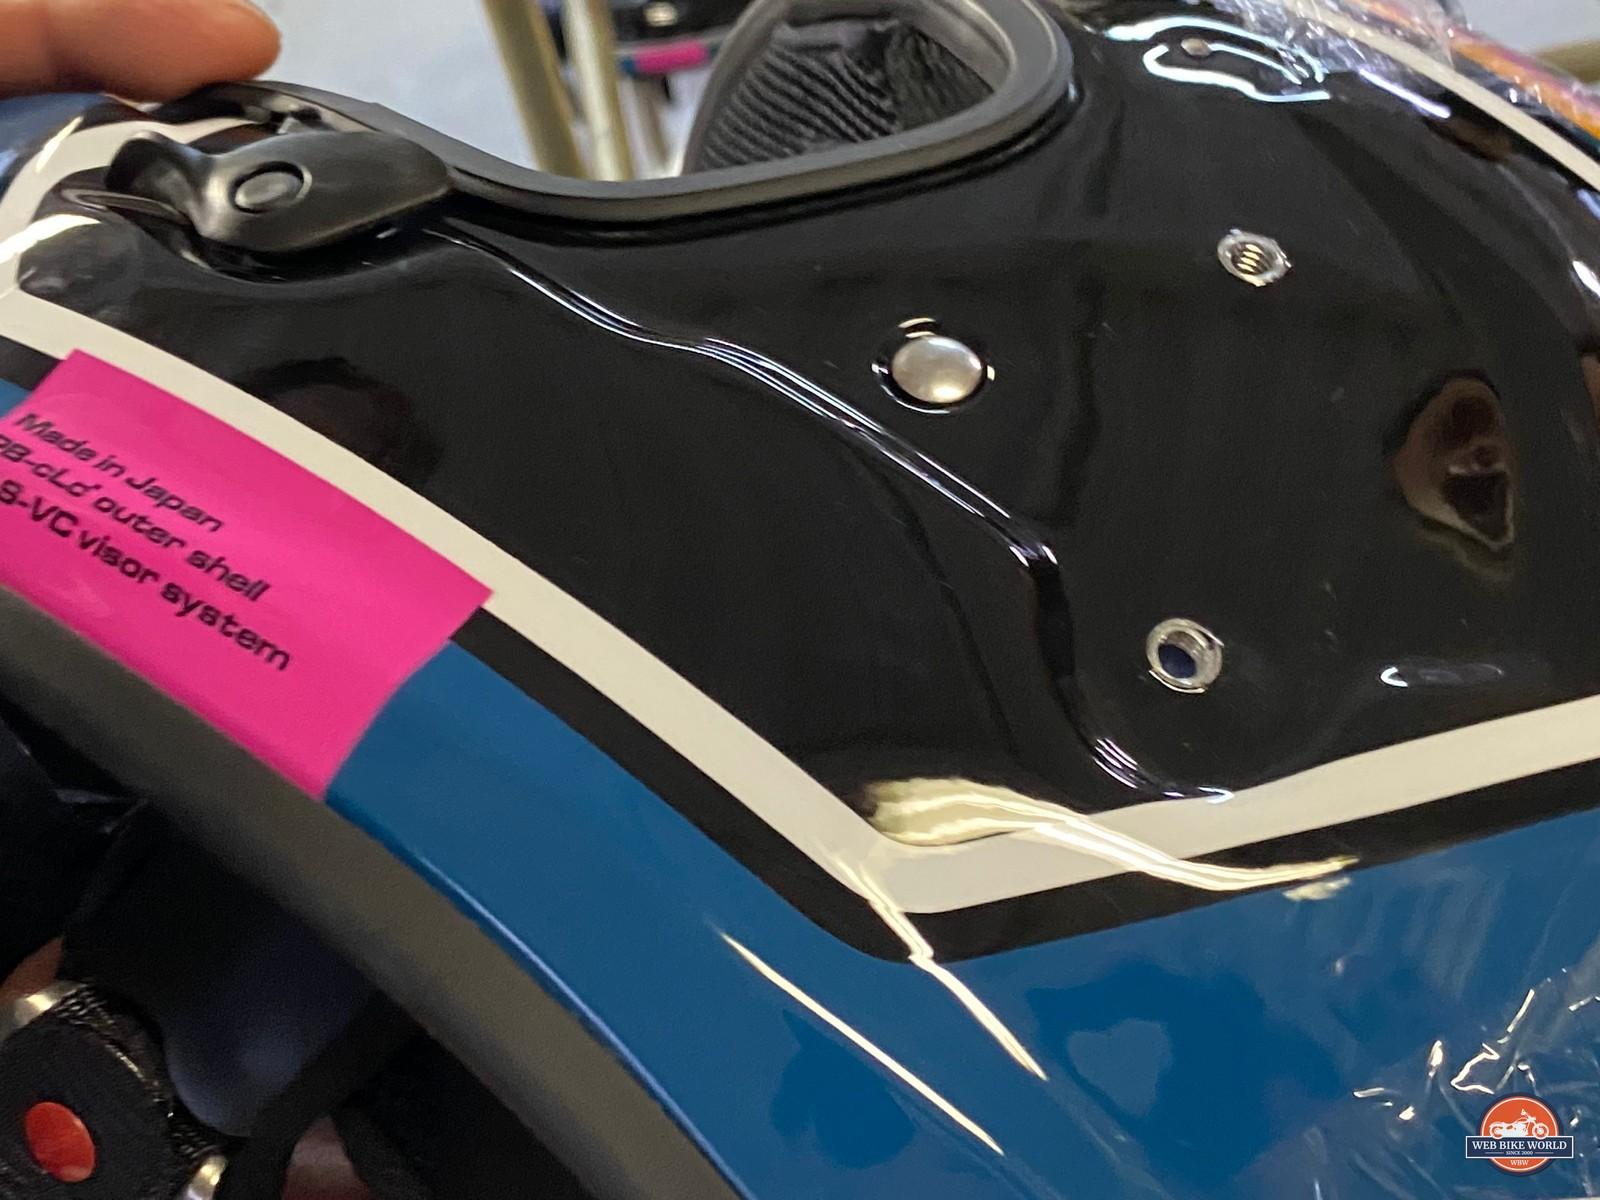 A chin strap rivet installed on an Arai helmet.